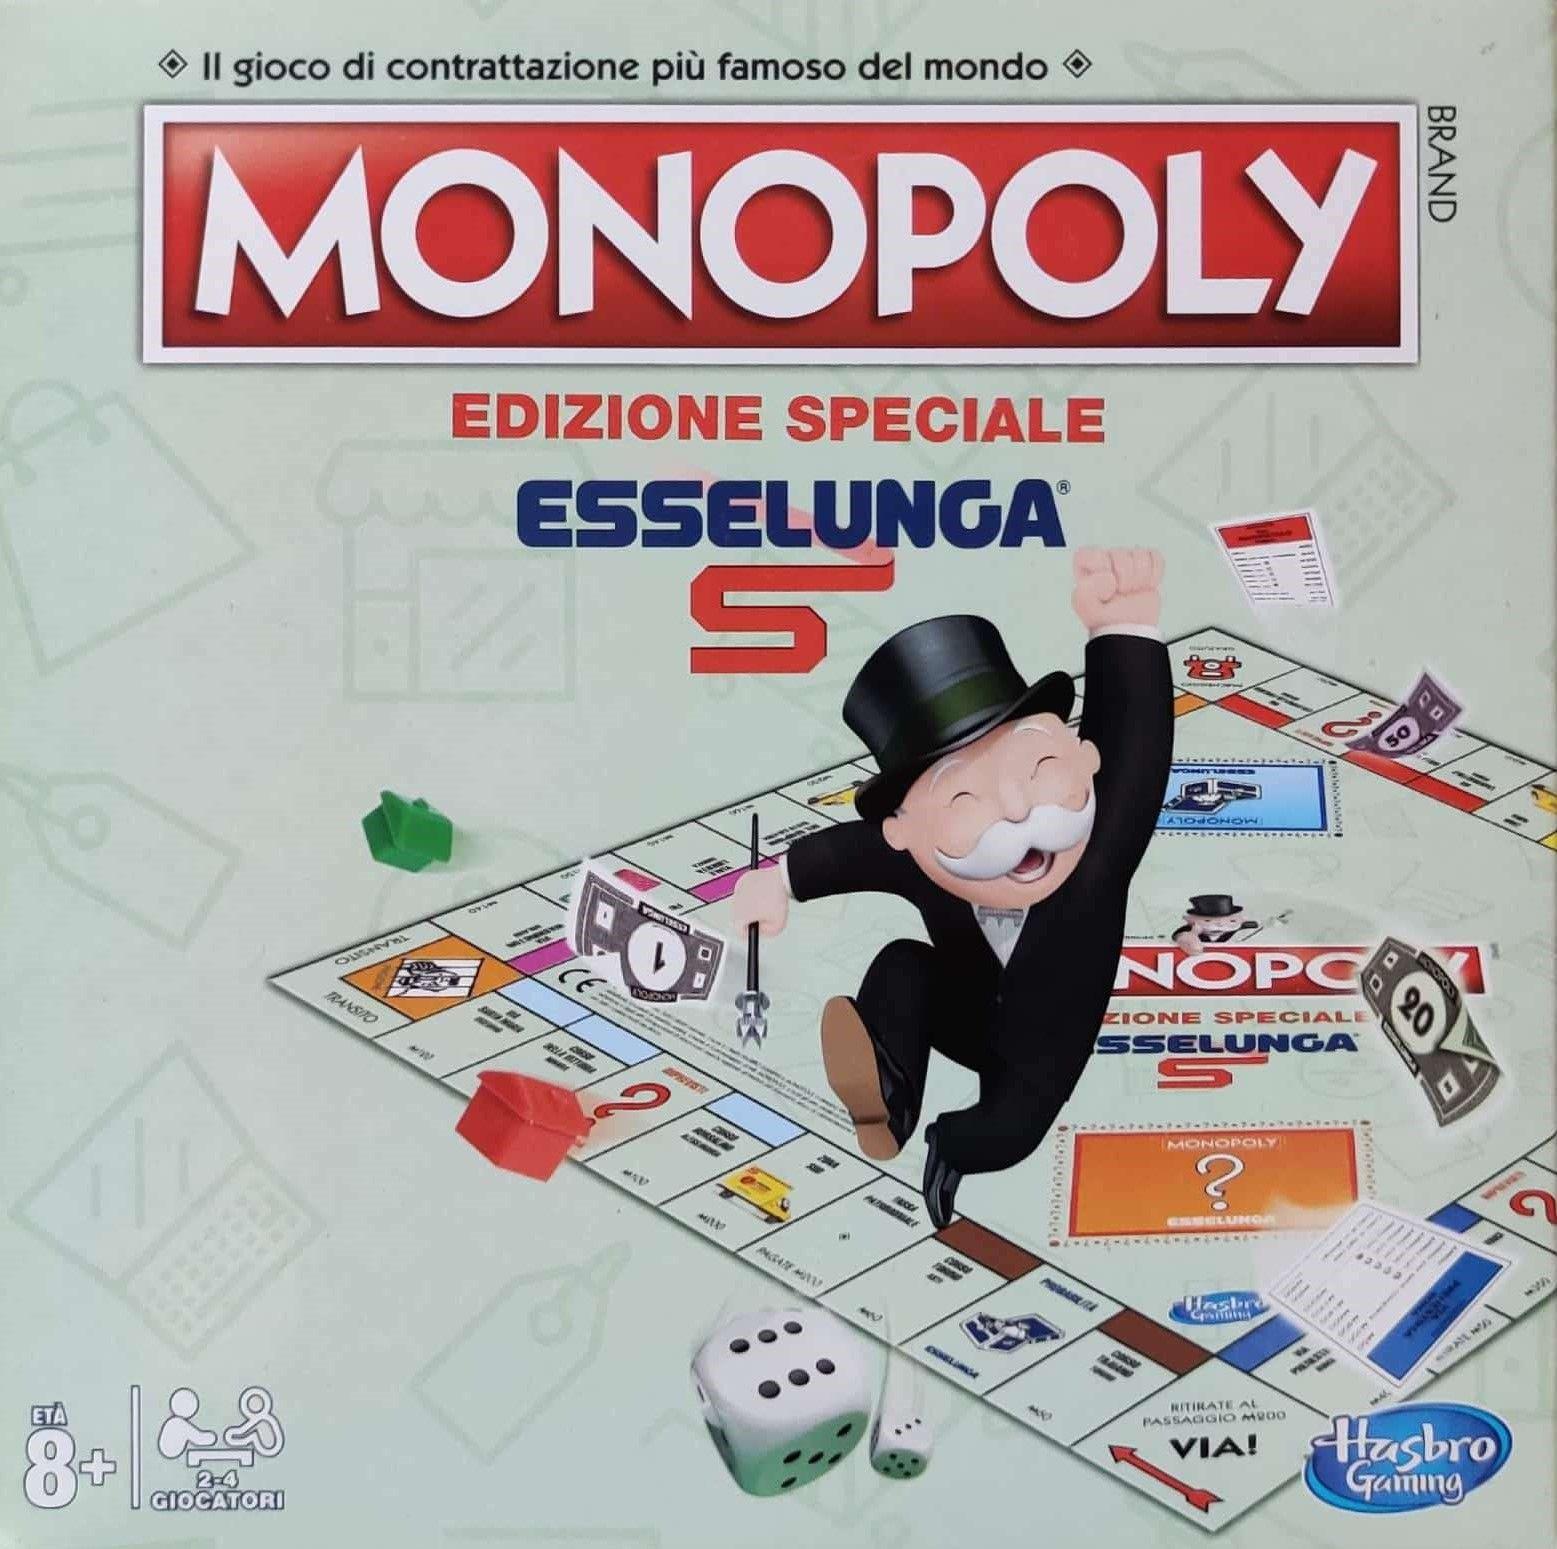 Monopoly: Esselunga